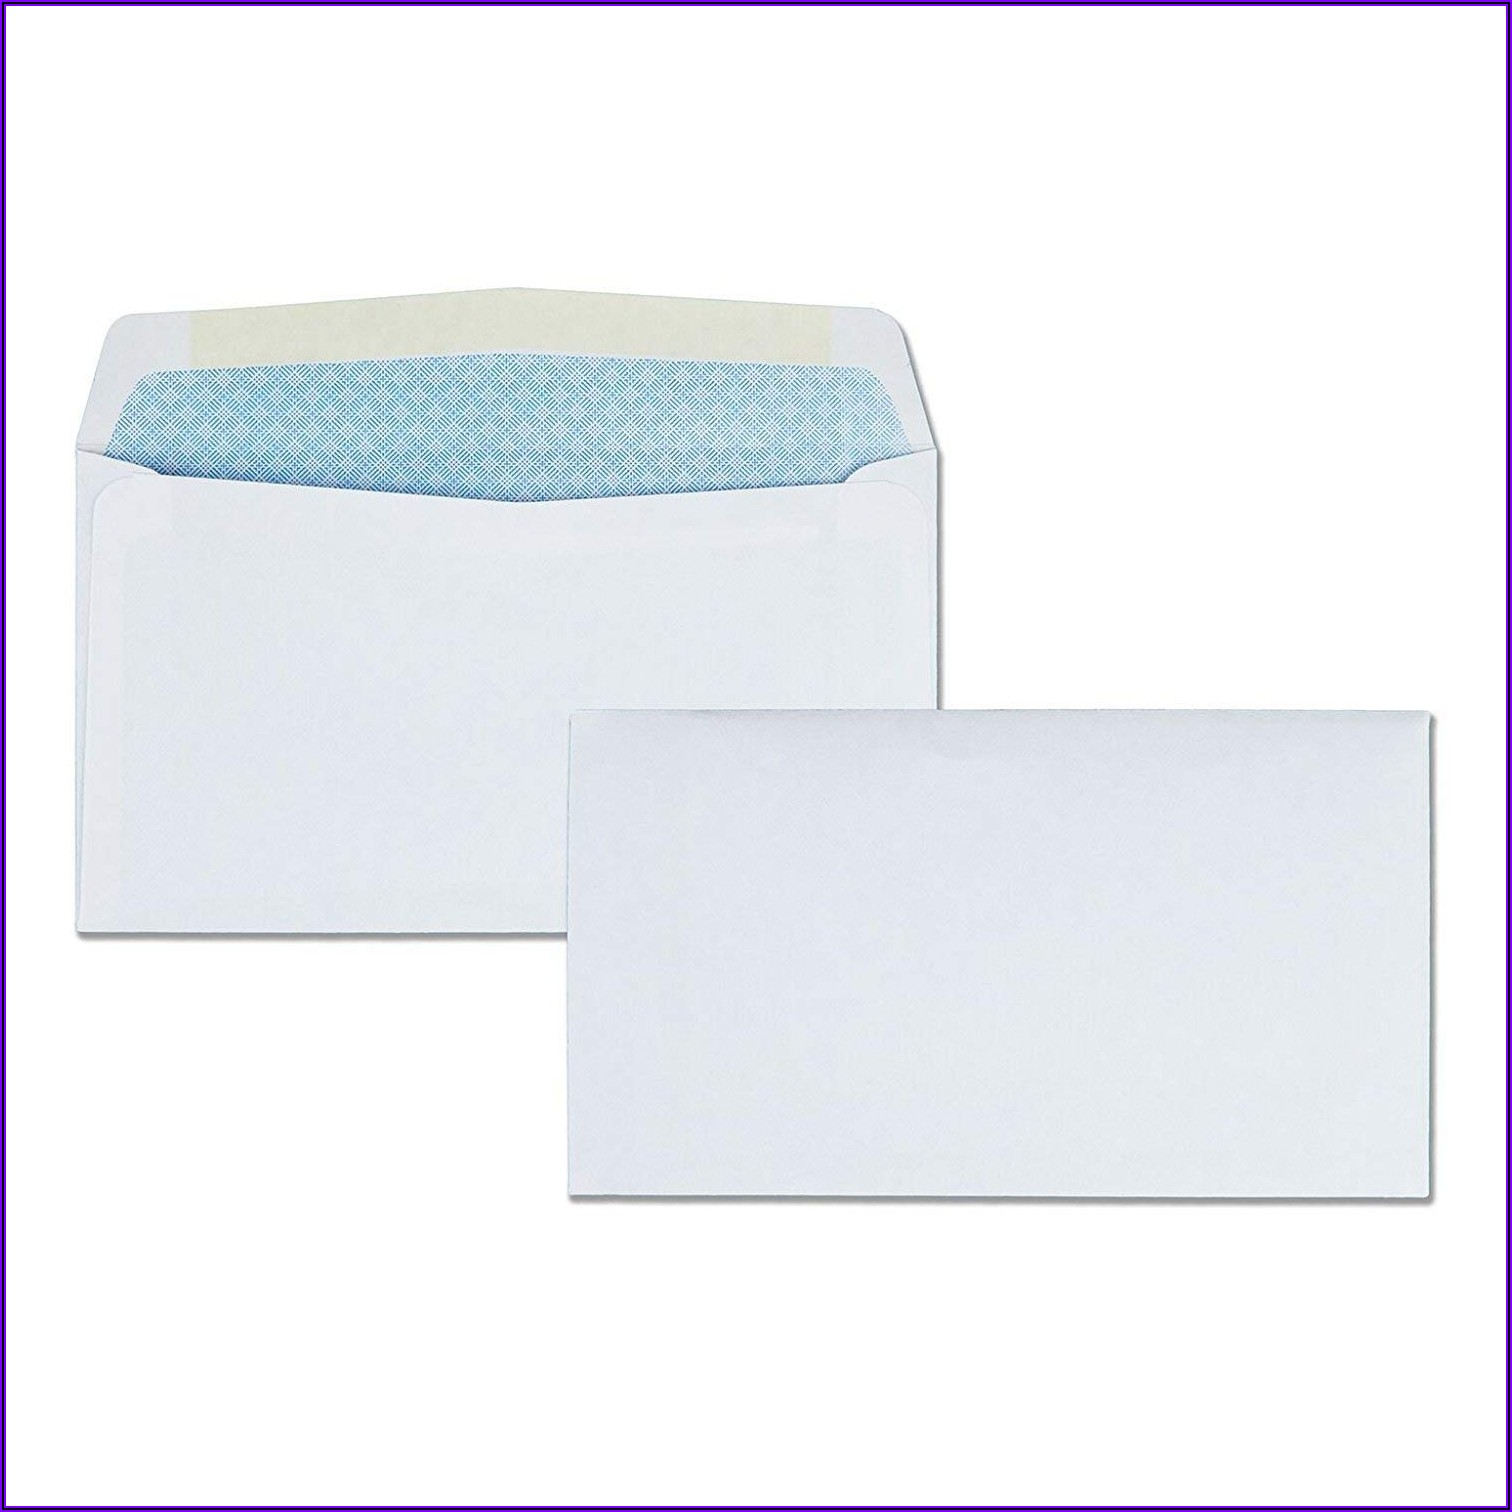 3 58 X 6 12 Envelopes